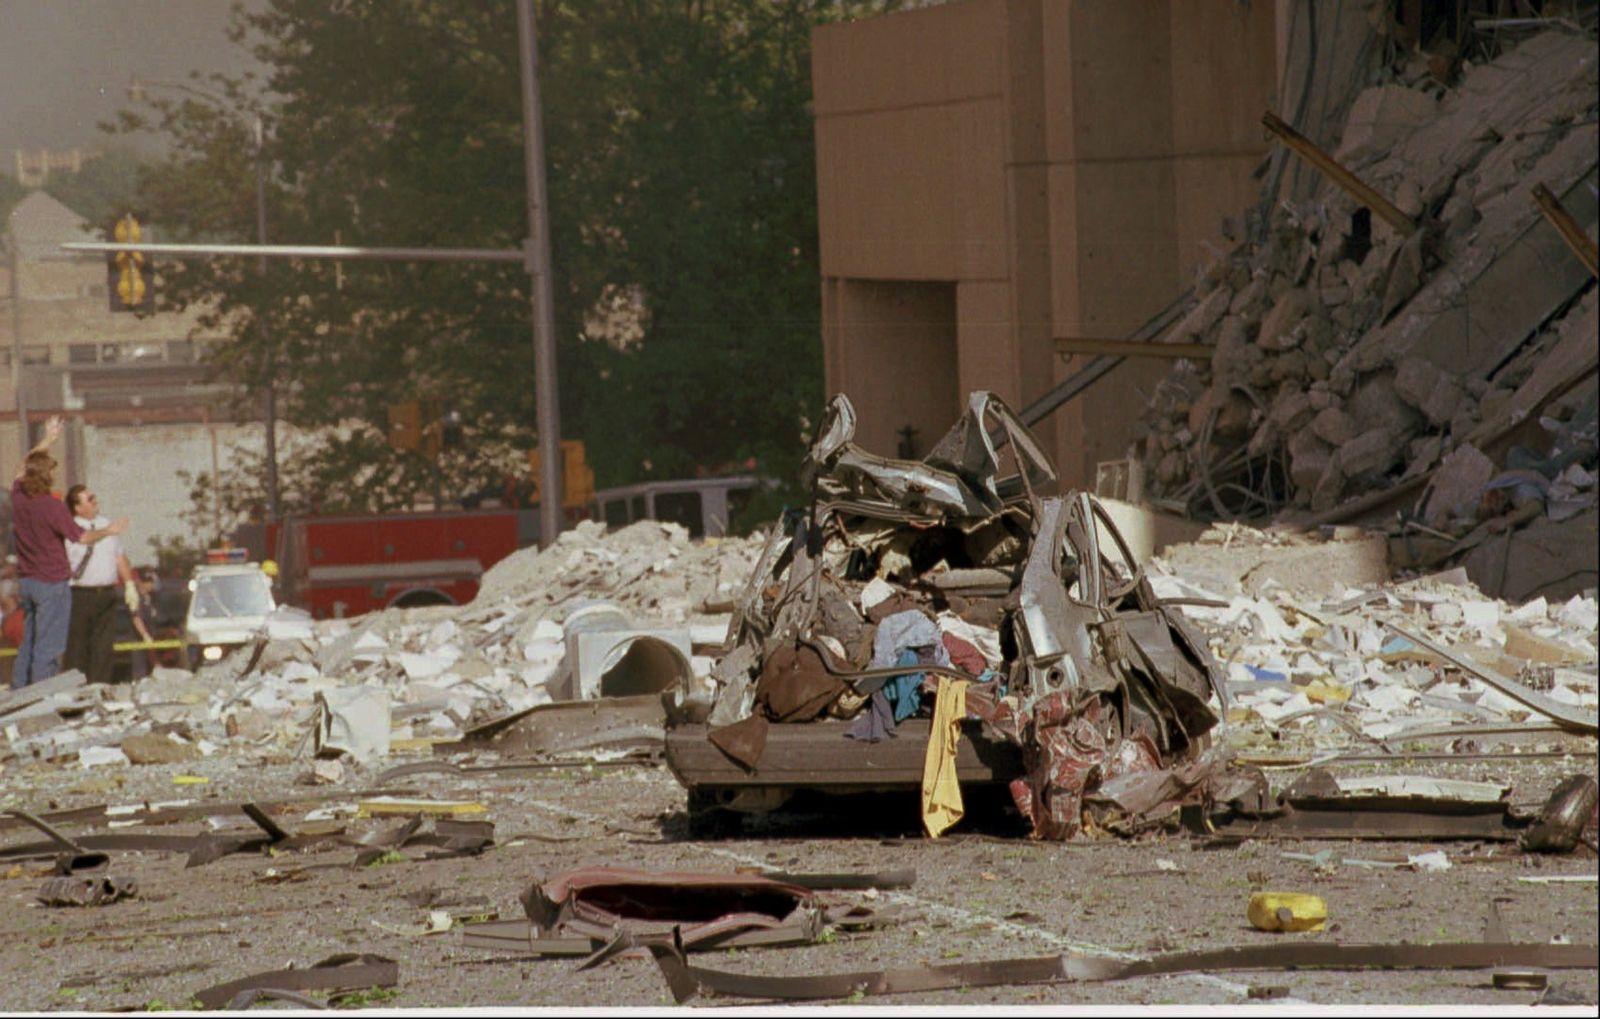 20th Anniversary of the Oklahoma City Bombing Photos | Image #4 - ABC News